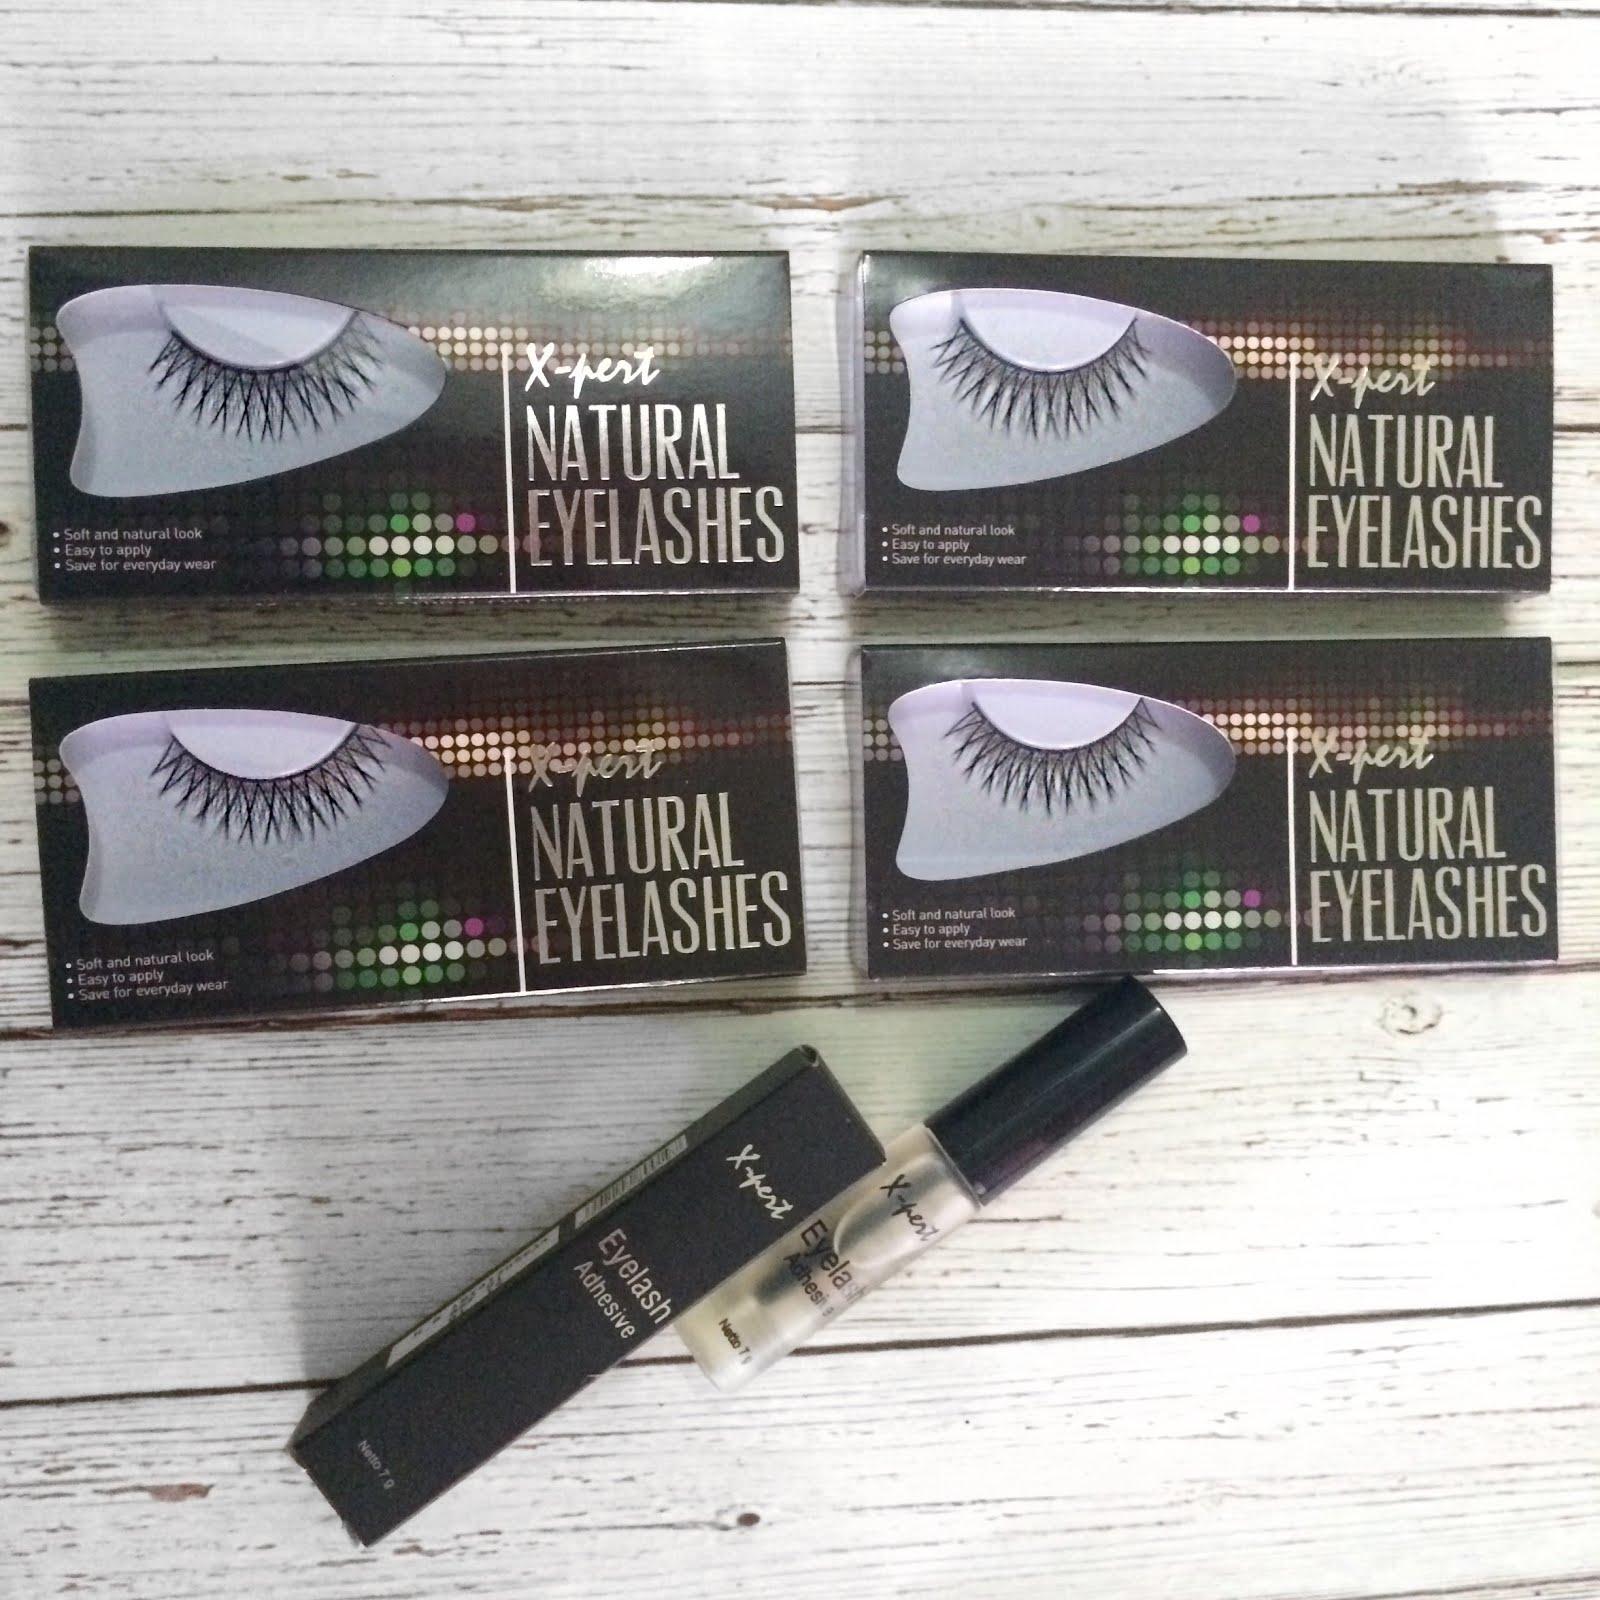 Review X Pert Good Affordable Eyelashes Handini Audita